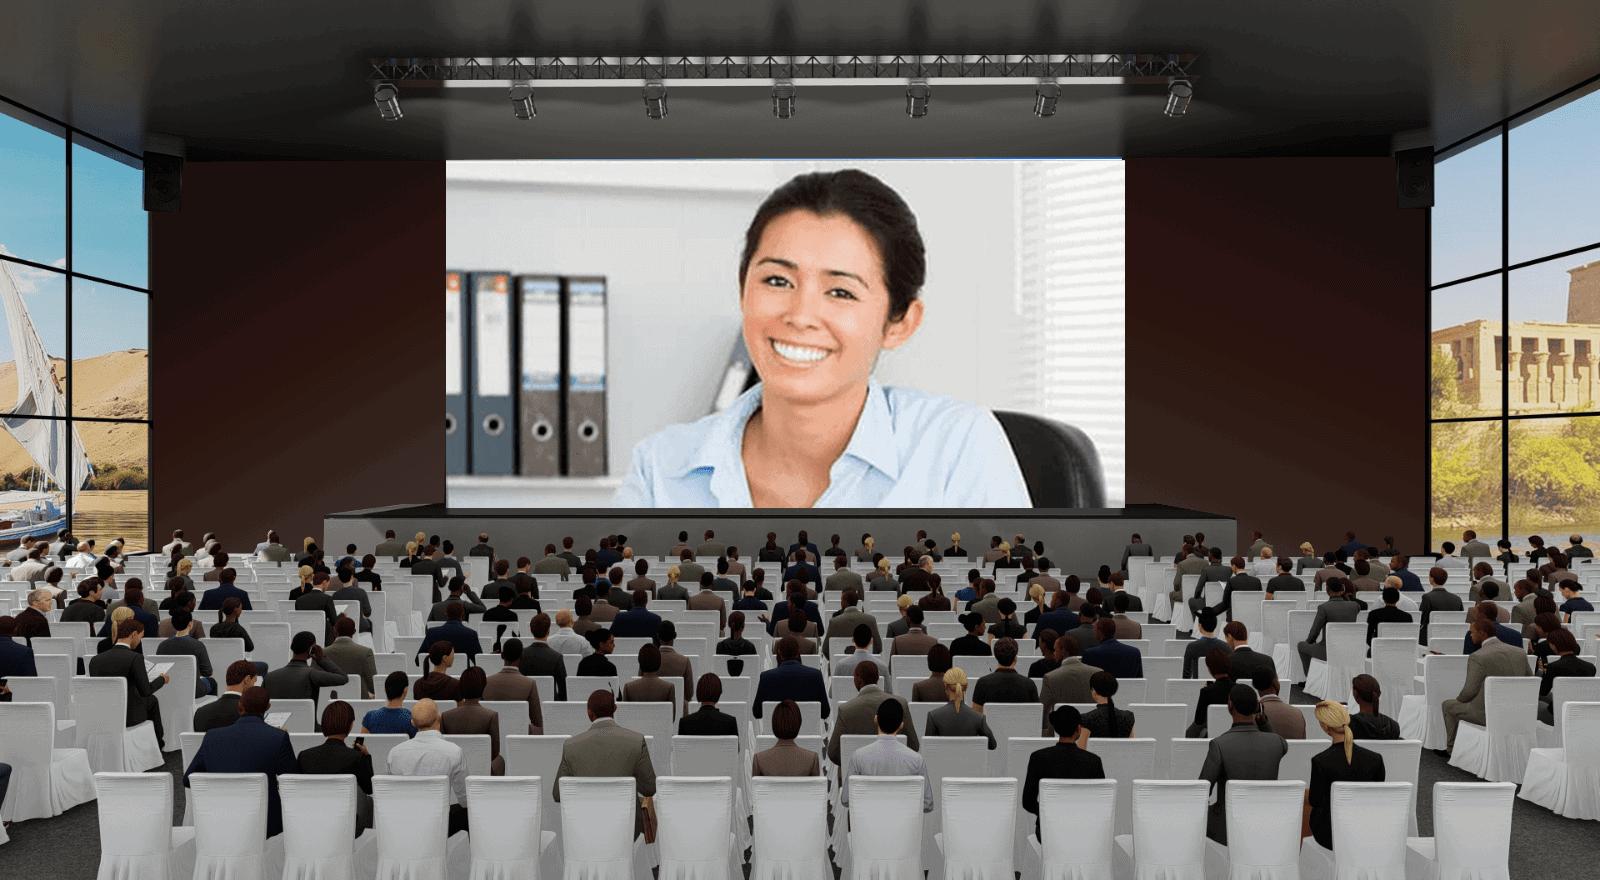 virtual auditorium in digital banking conferences